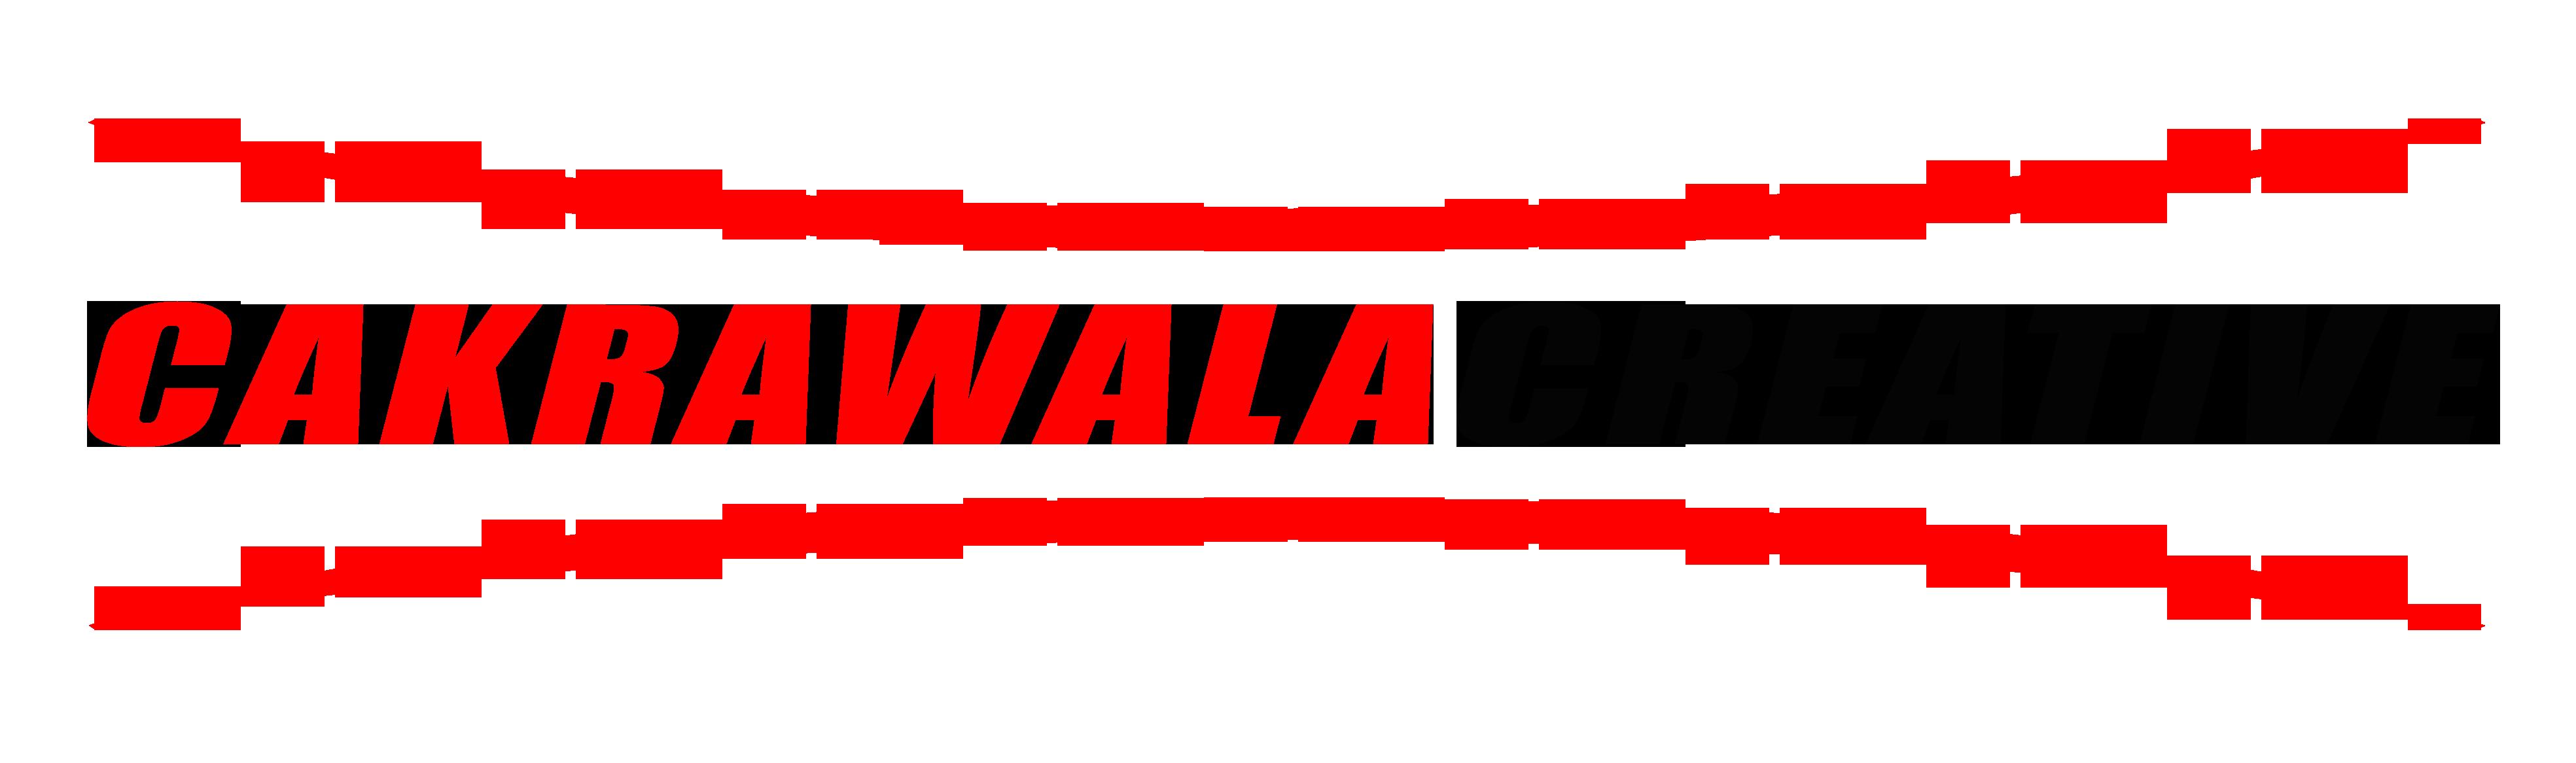 Cakrawala Creative Logo